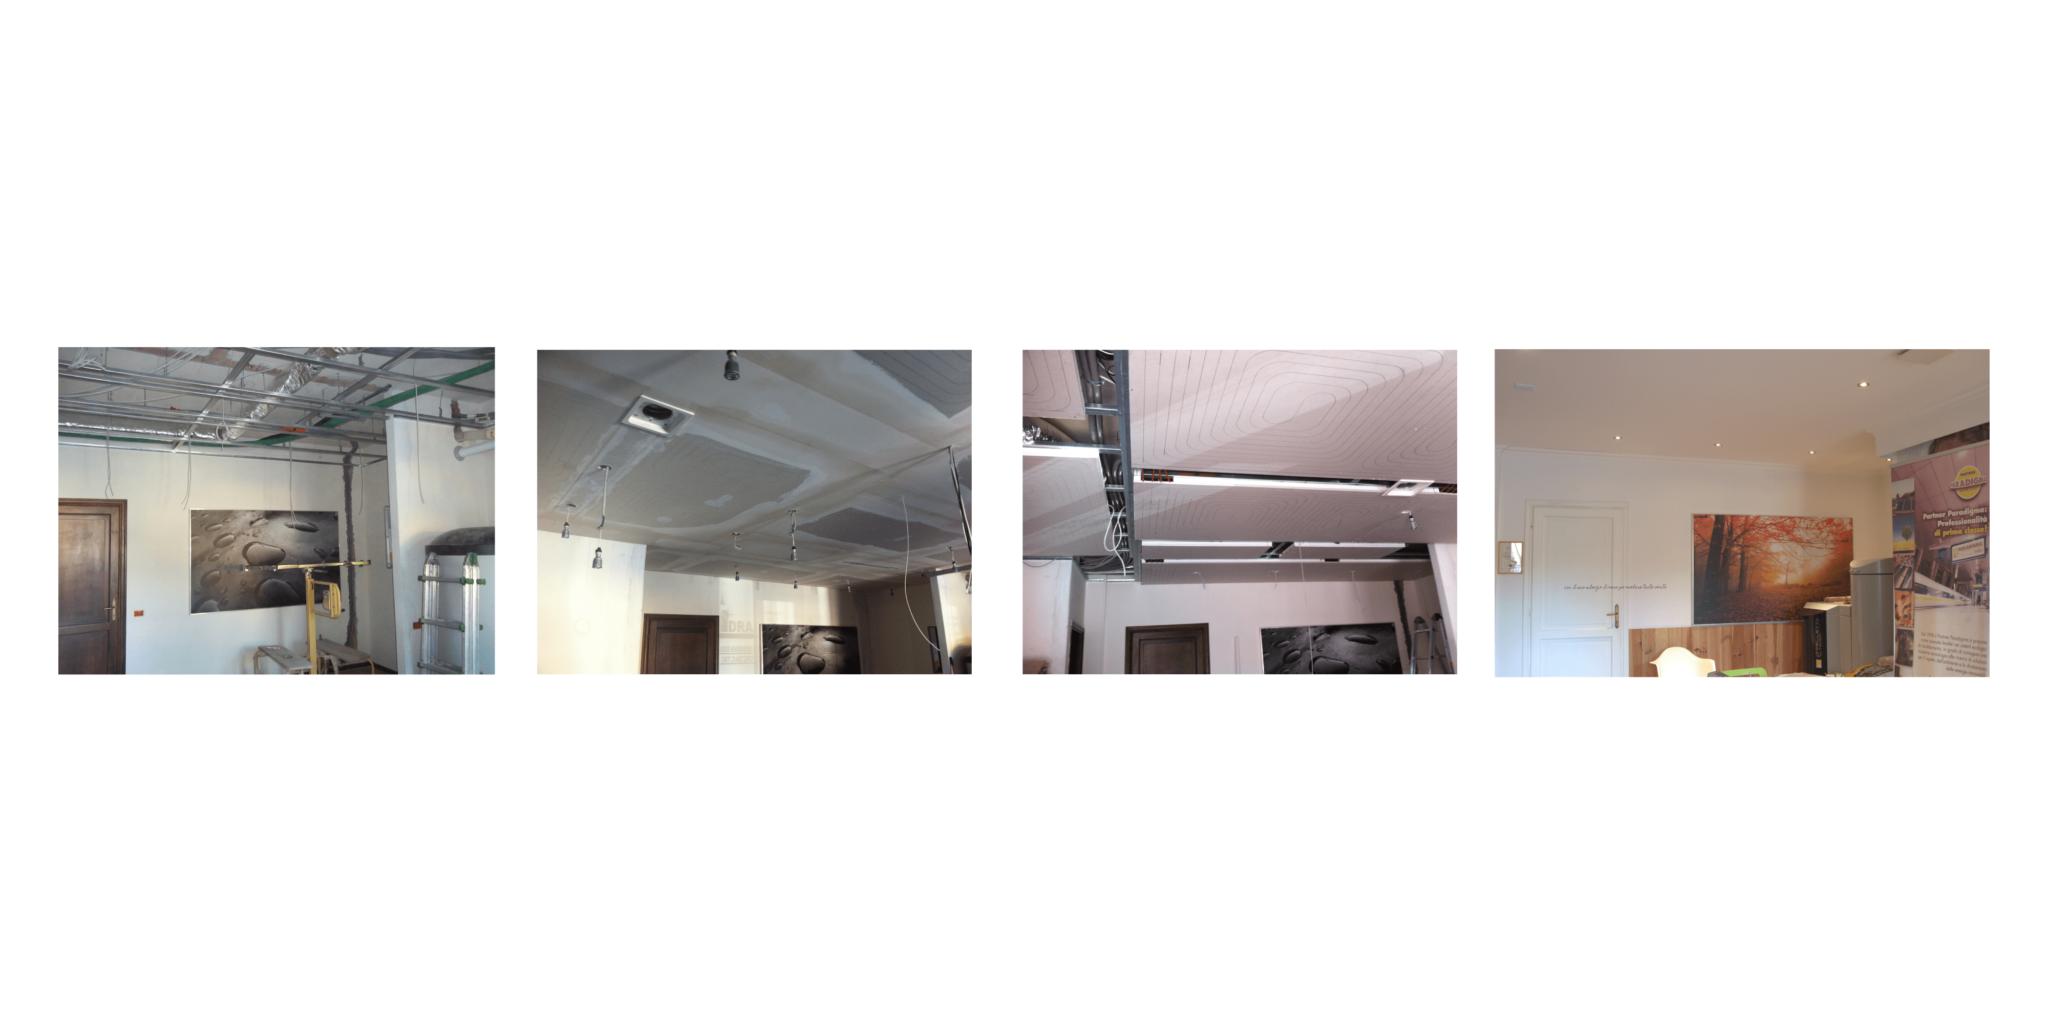 ristrutturazione-ufficio-idra-energia-pulita-impianti-idraulici (2)